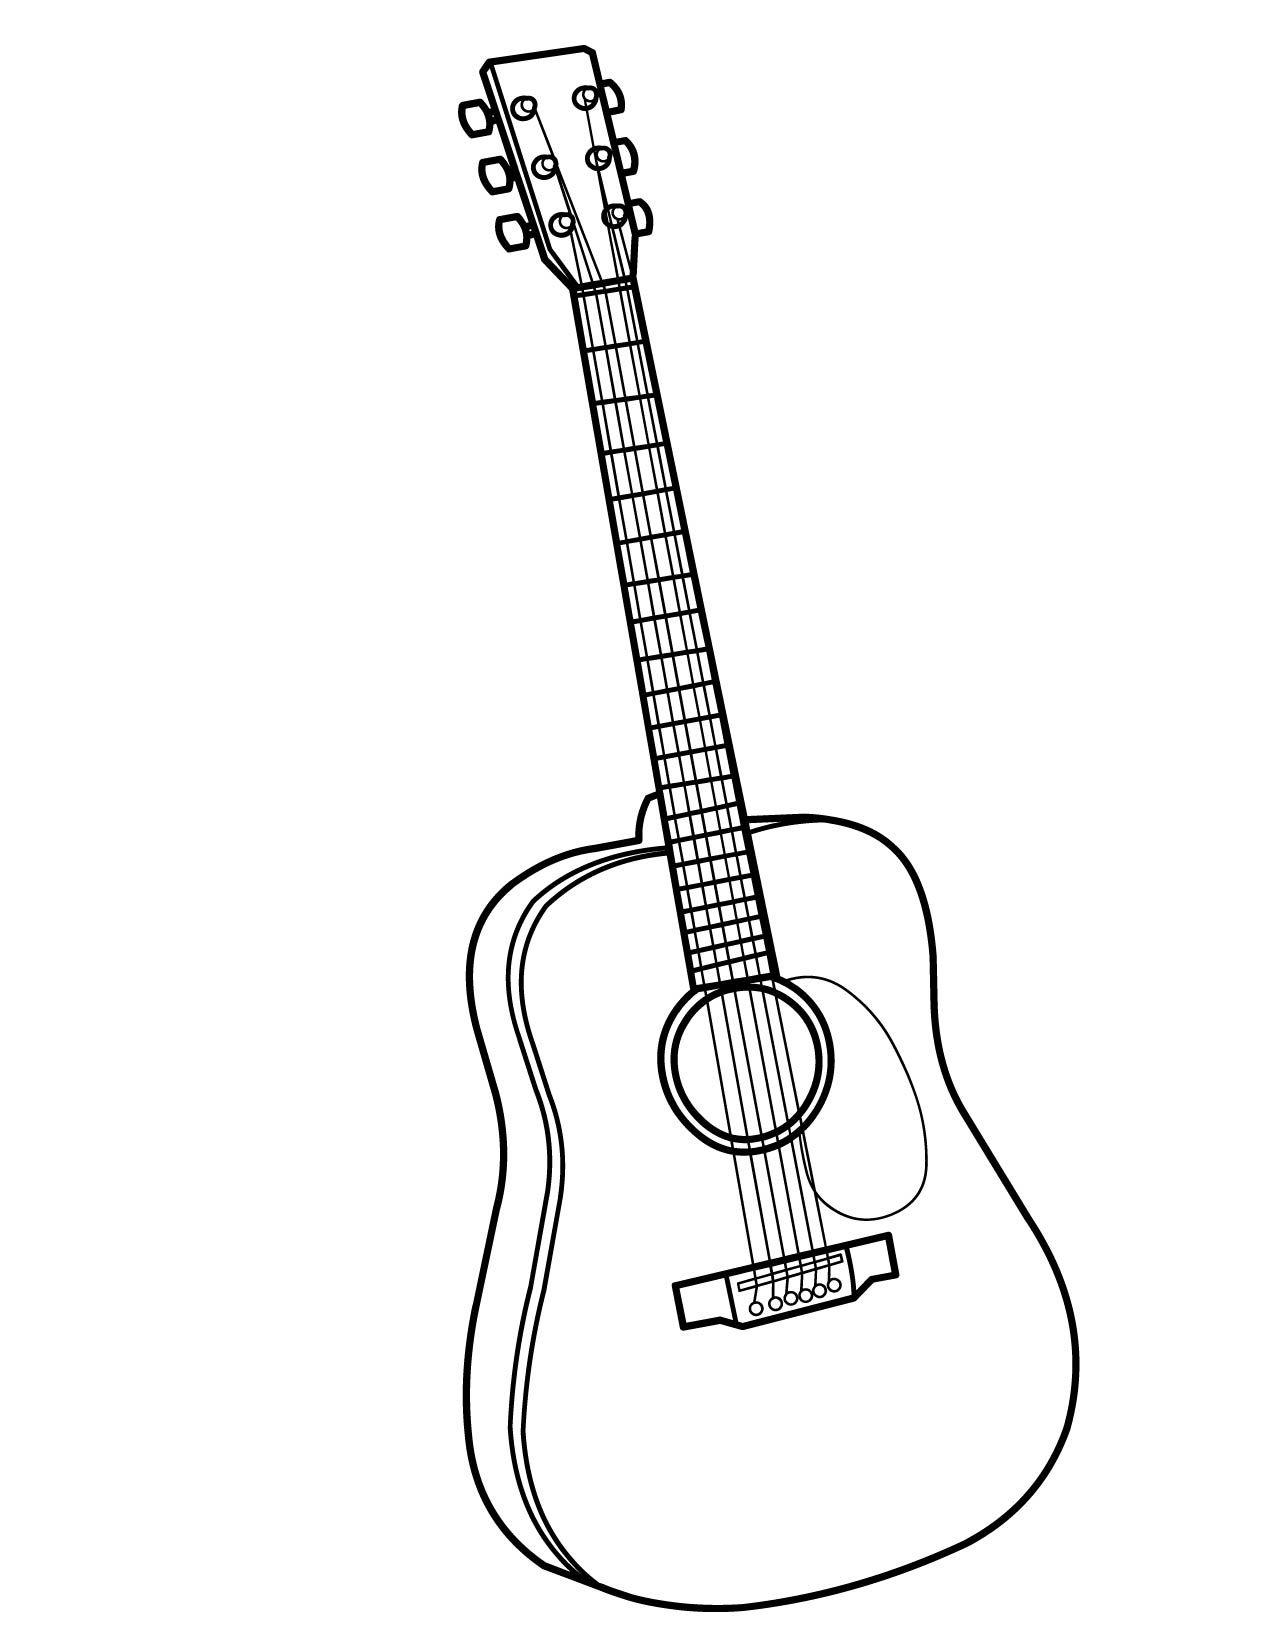 Gitara Jpg 1 275 1 650 Pixels Music Coloring Coloring For Kids Music Instruments